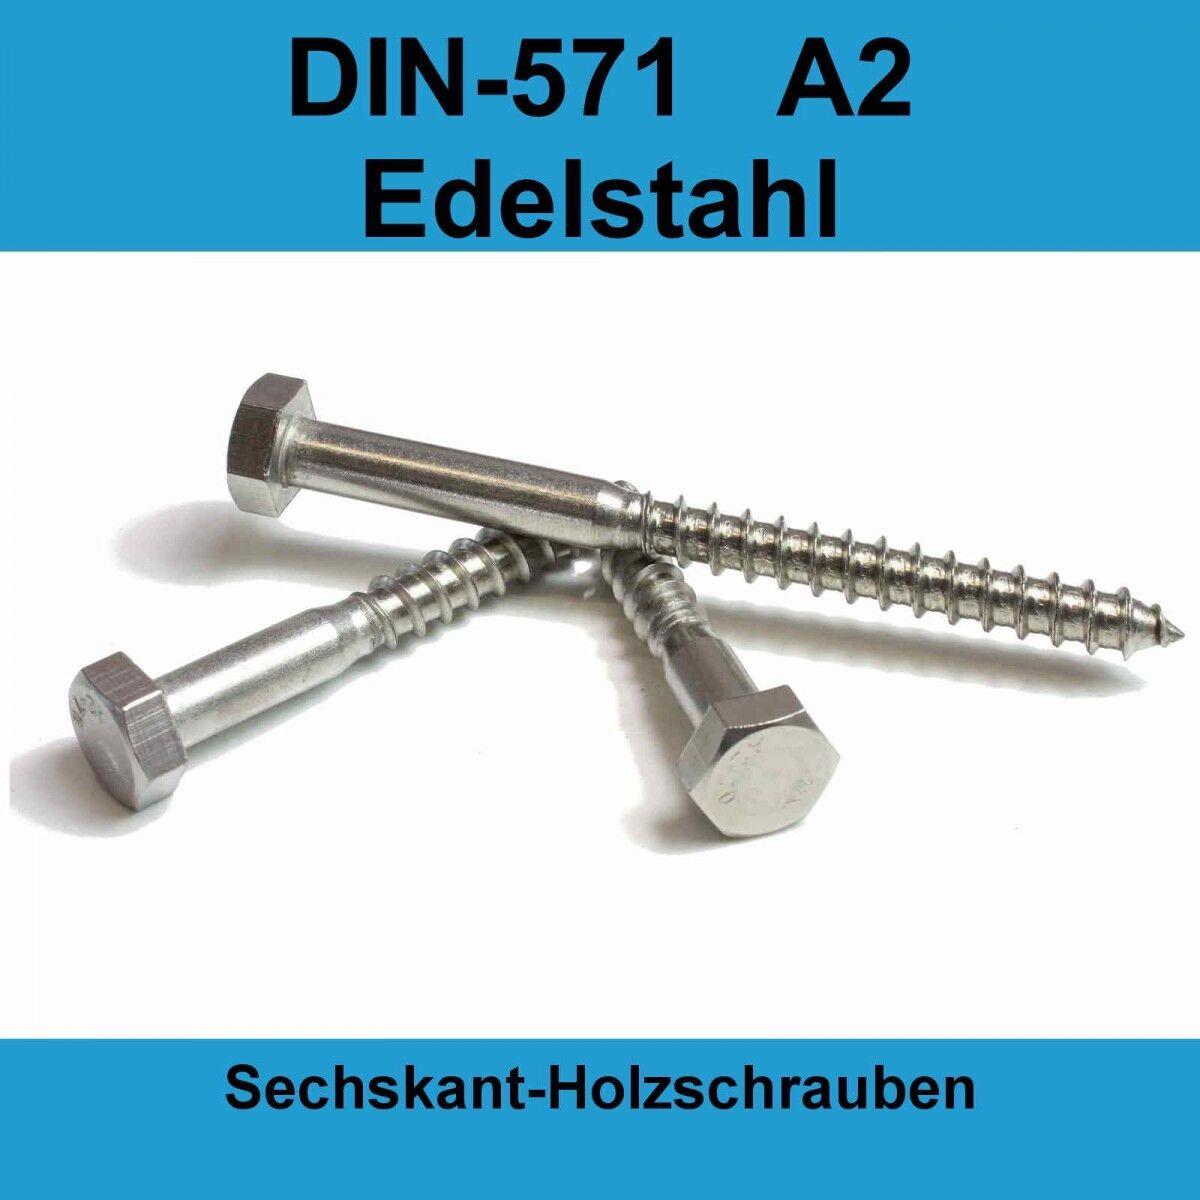 M8 DIN 571 Holzschrauben A2 Edelstahl Sechskant Schlüsselschrauben Holzbau Holzbau Holzbau M8x | Vorzüglich  ab9511